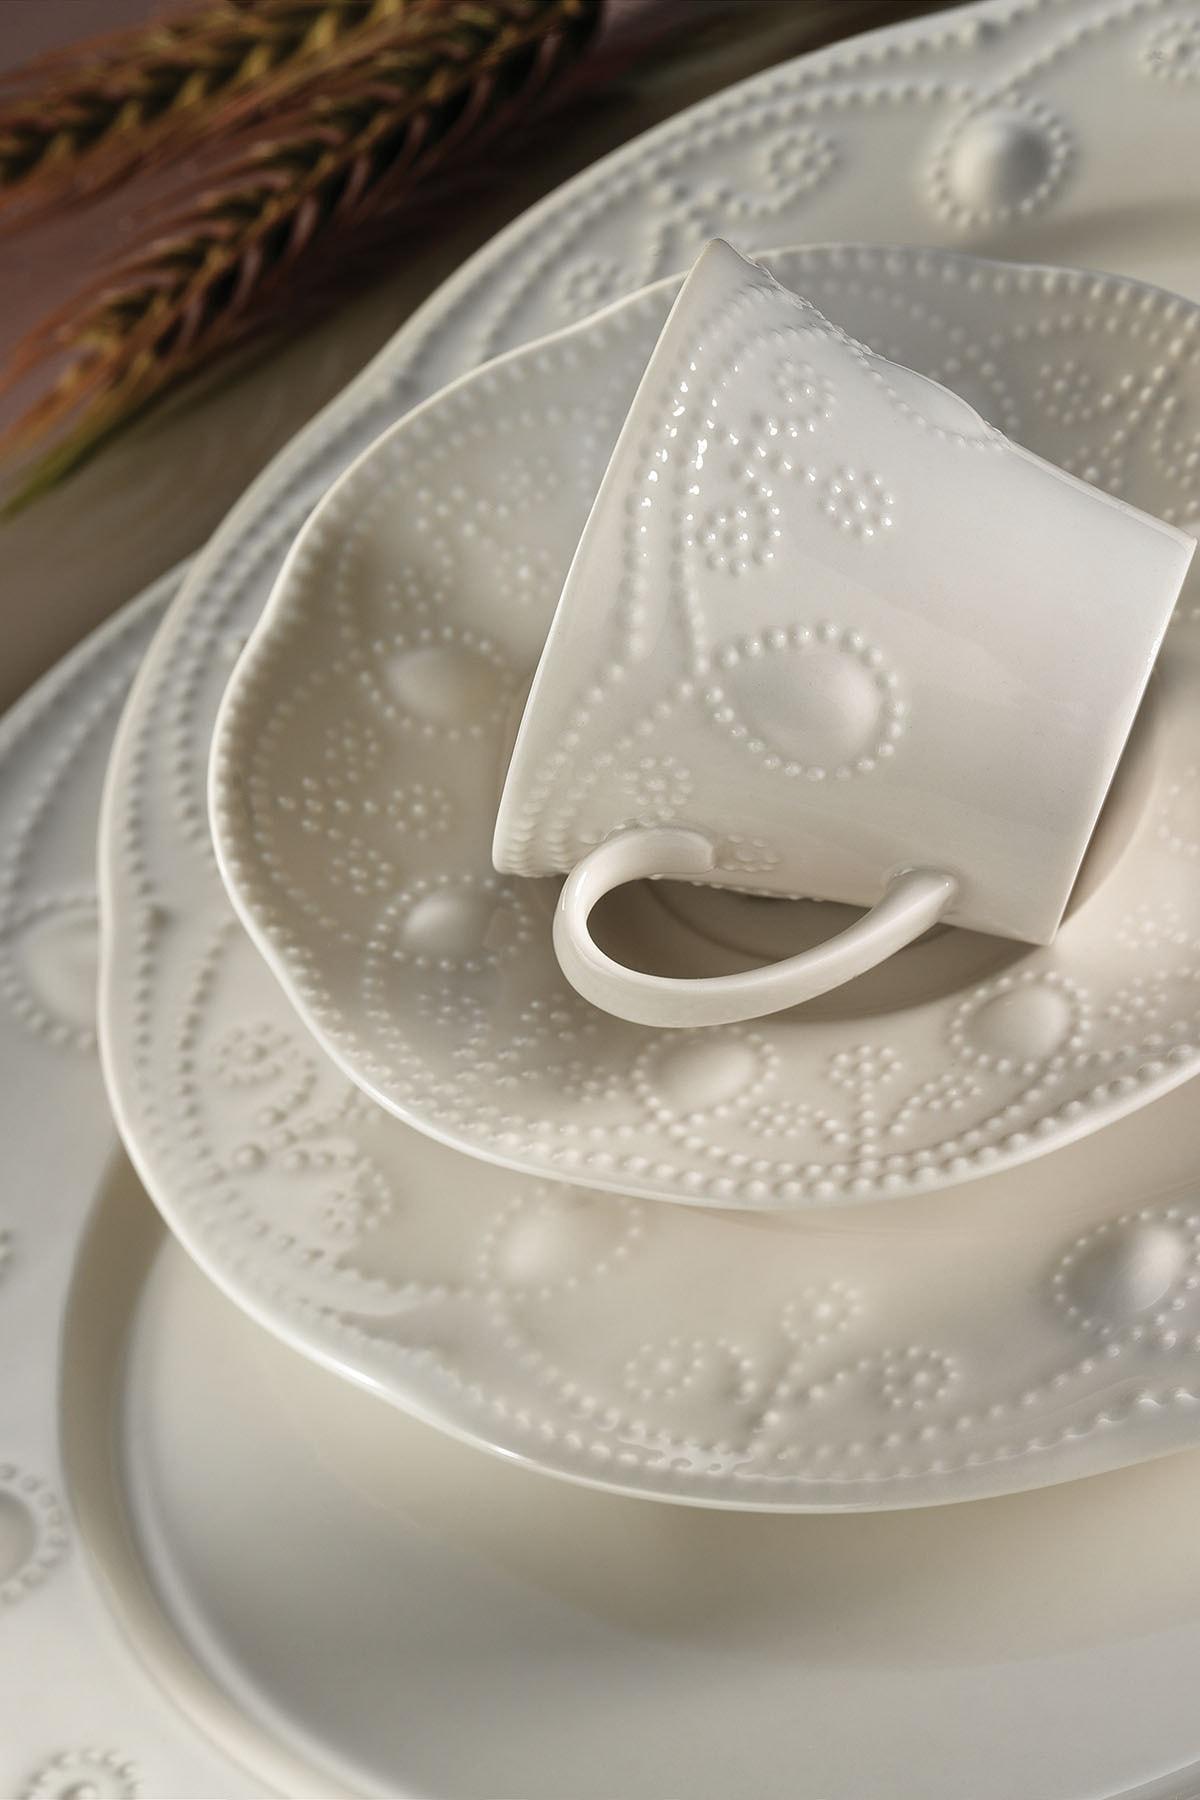 Kütahya Porselen Fulya Krem 24 Parça Yemek Seti 1